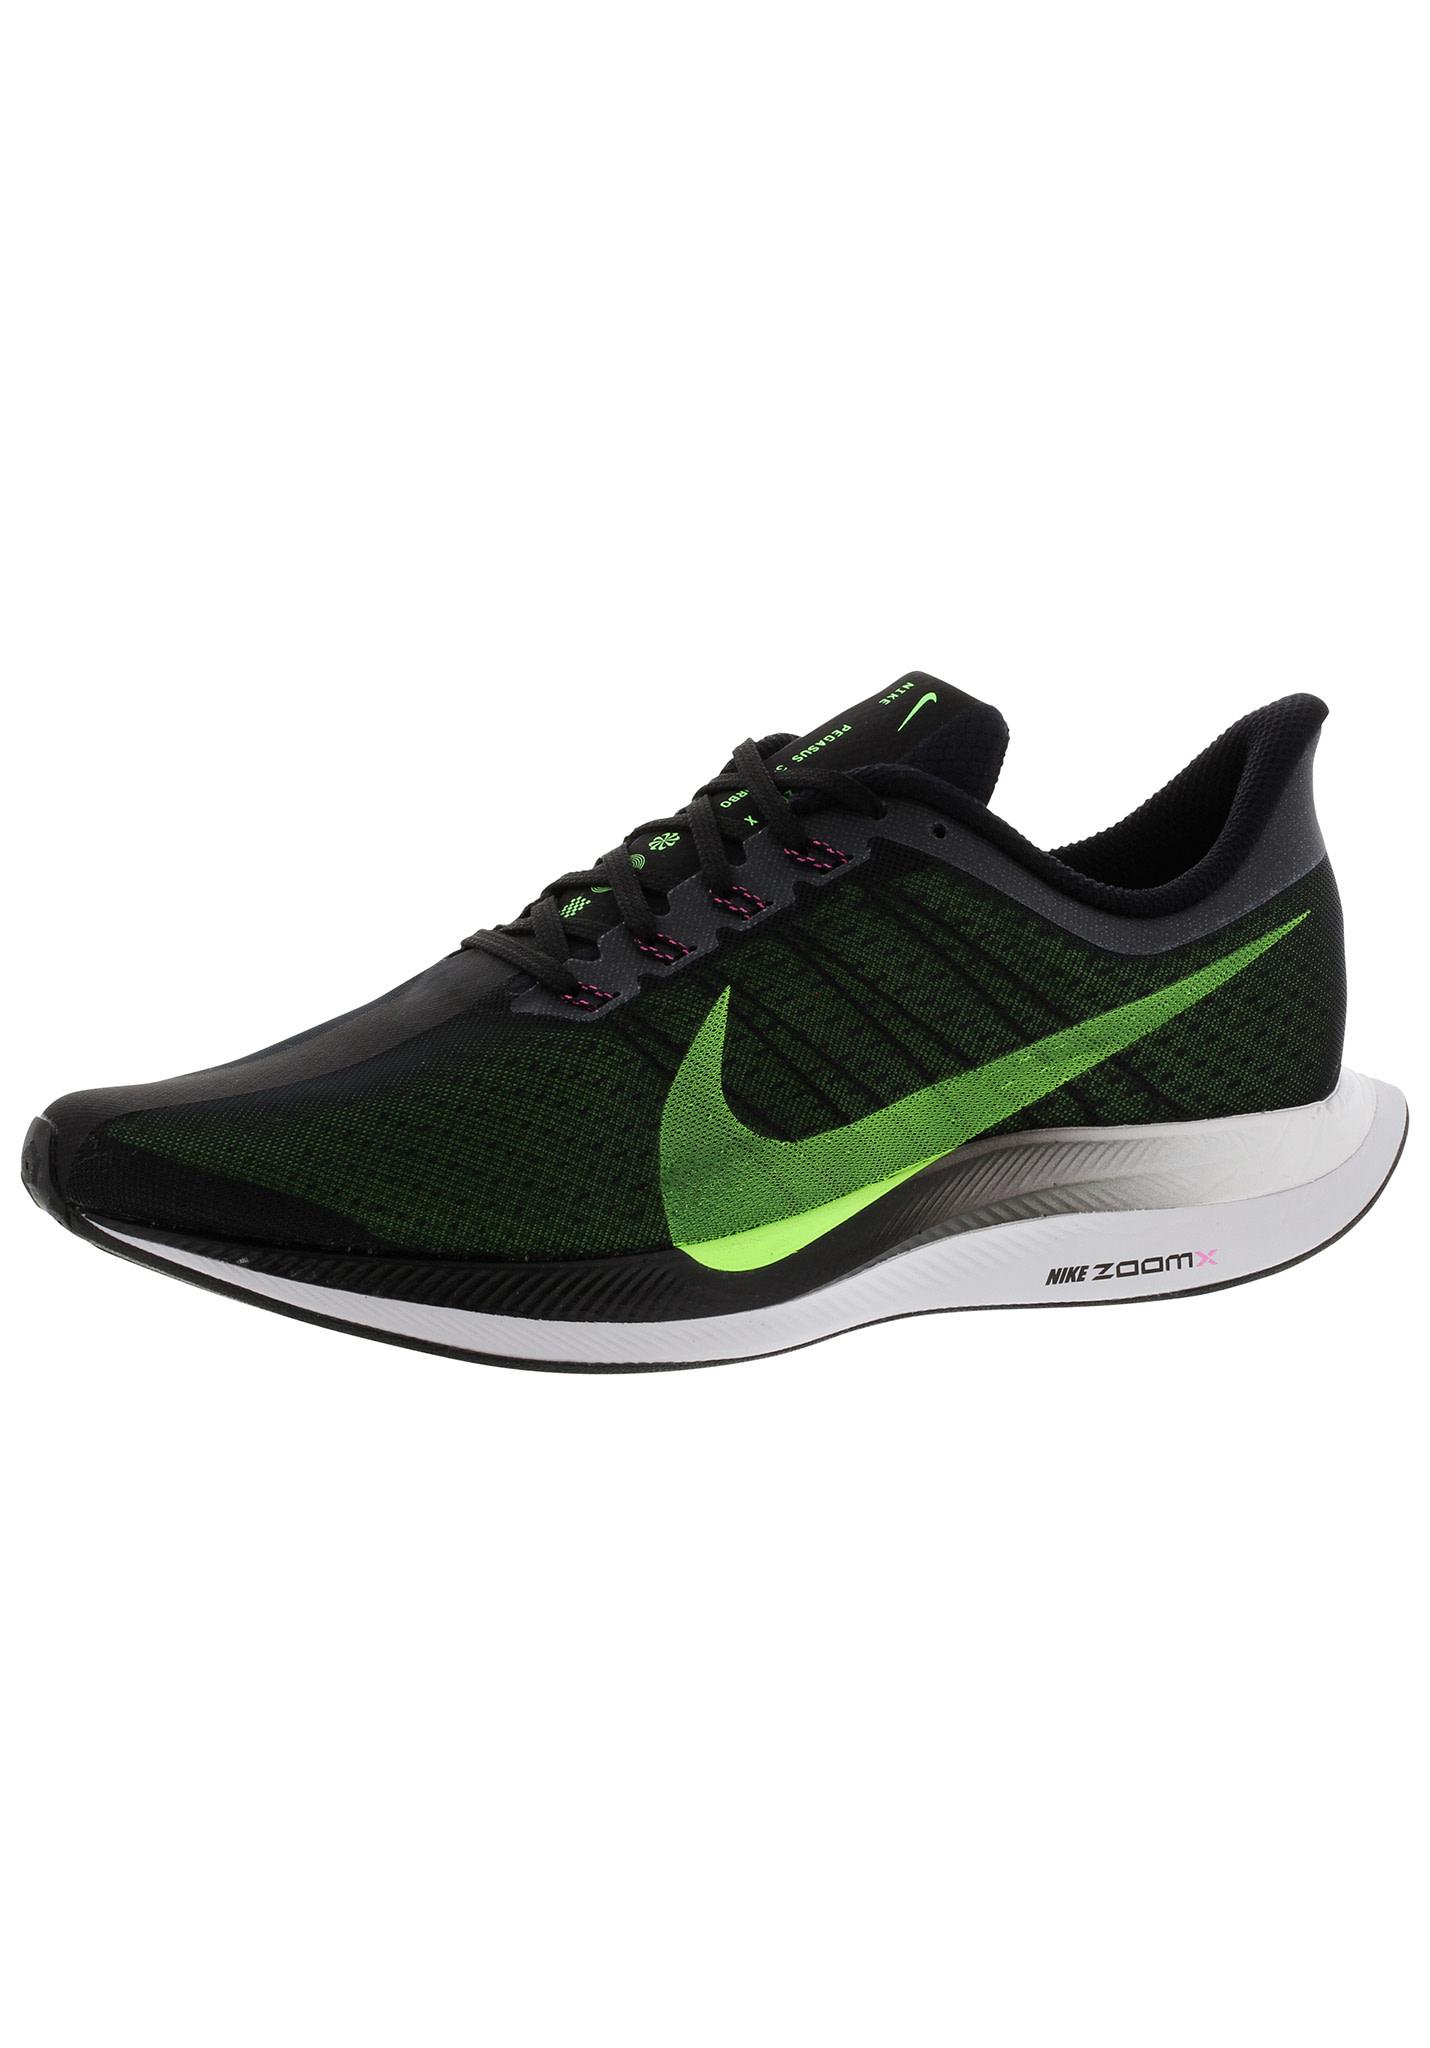 Nike Zoom Pegasus Turbo - Laufschuhe für Herren - Grün